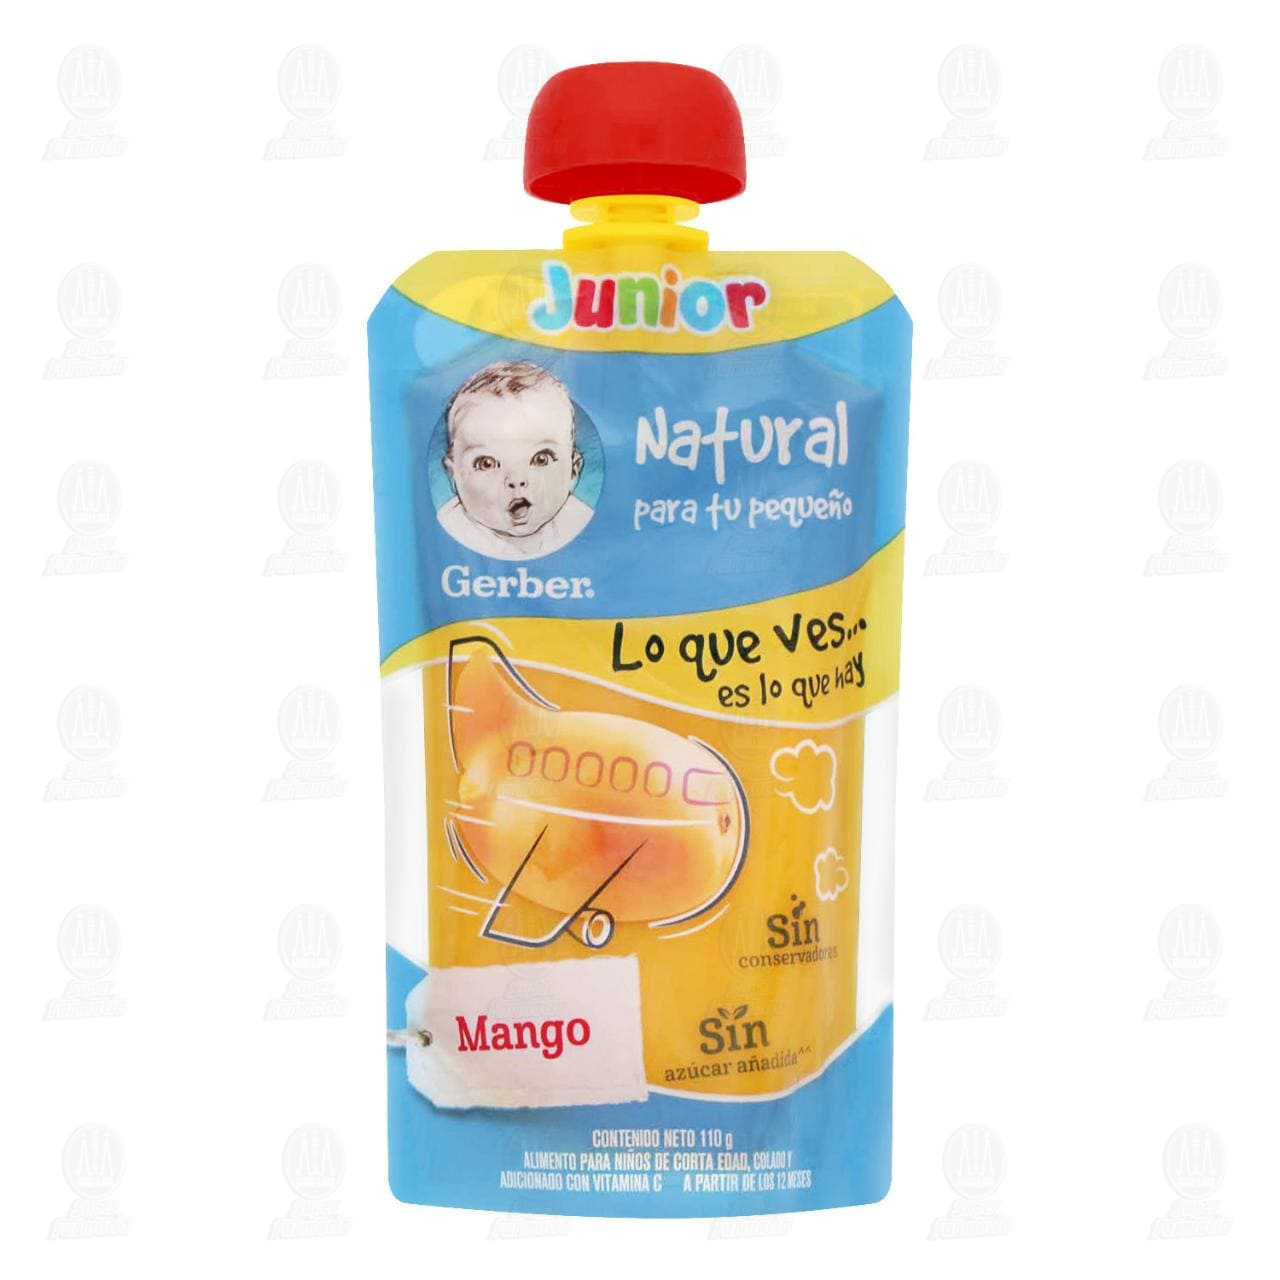 comprar https://www.movil.farmaciasguadalajara.com/wcsstore/FGCAS/wcs/products/1236873_S_1280_F.jpg en farmacias guadalajara